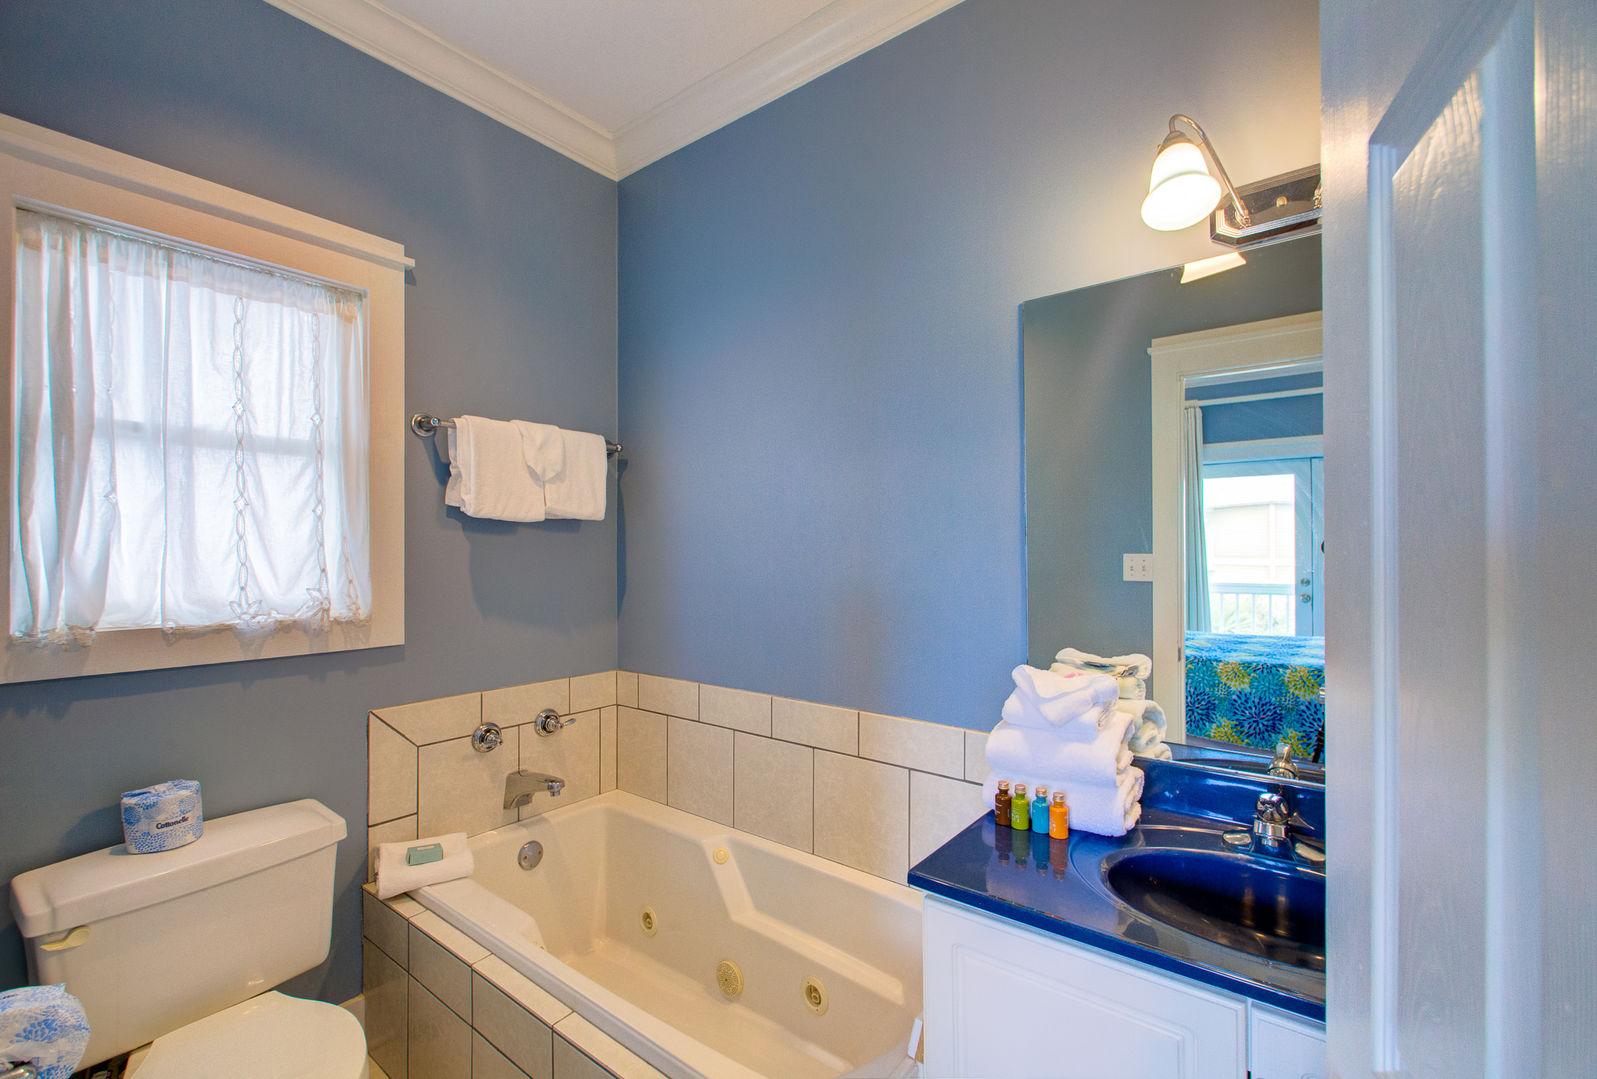 Single Vanity Sink, Mirror, Bathtub, and Toilet.